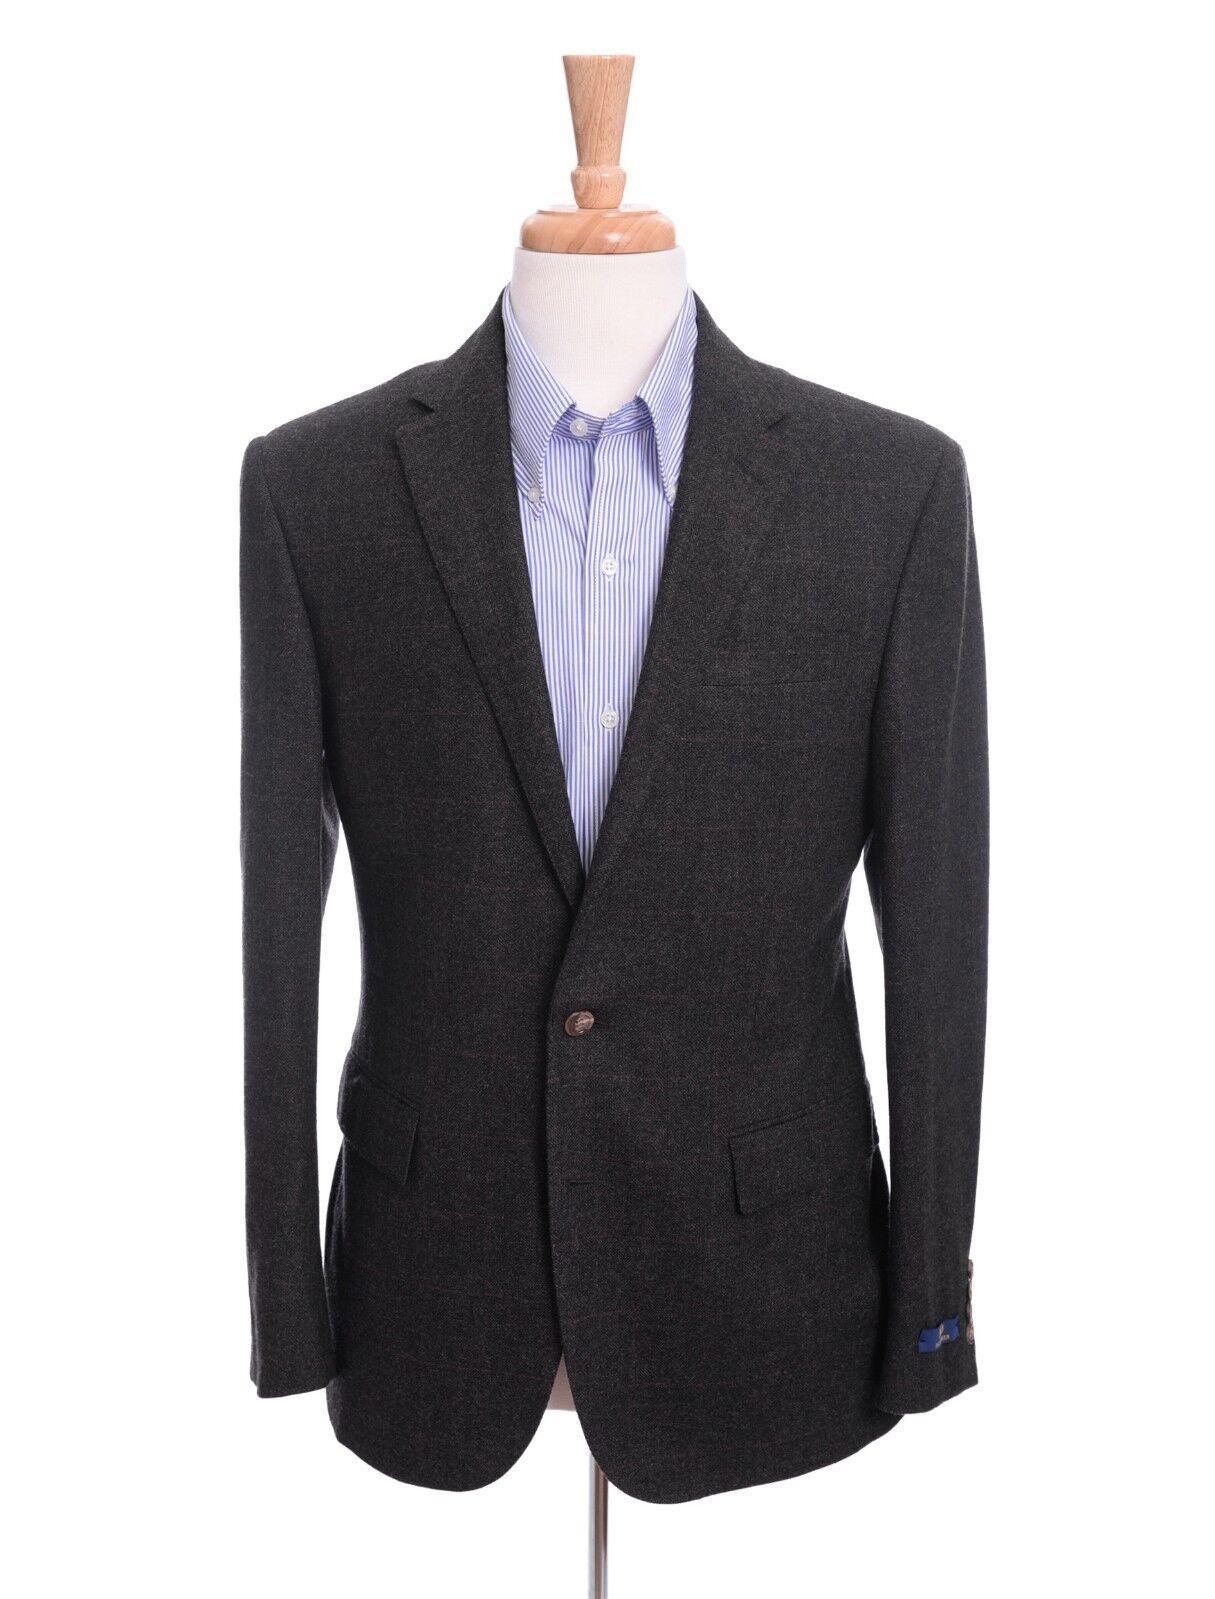 Polo Ralph Lauren 38R grau Plaid Custom Fit Wool Blazer Sportcoat Slovakia